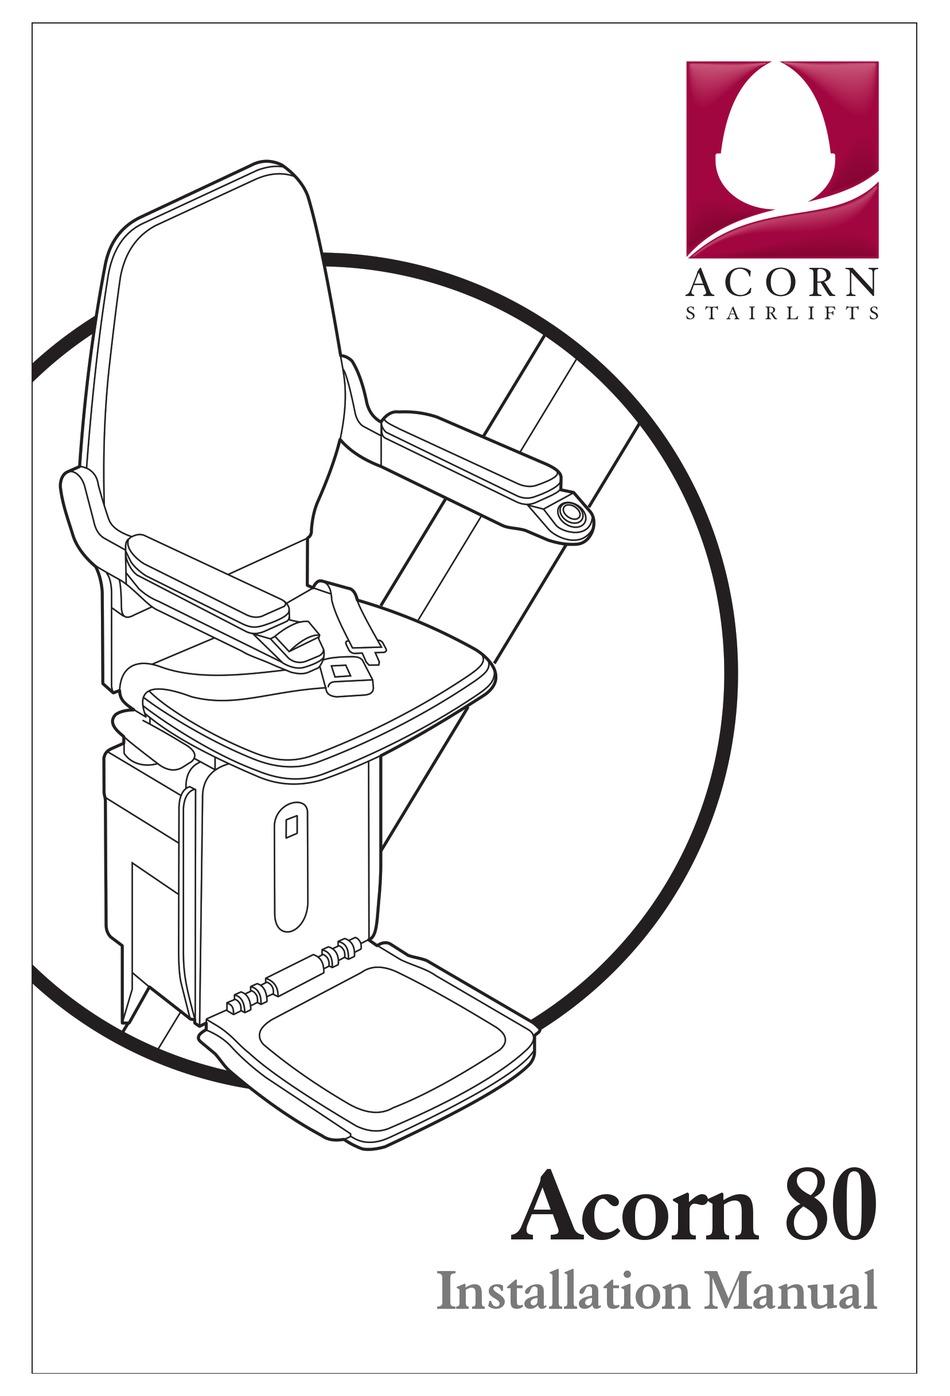 Acorn 80 Installation Manual Pdf Download Manualslib